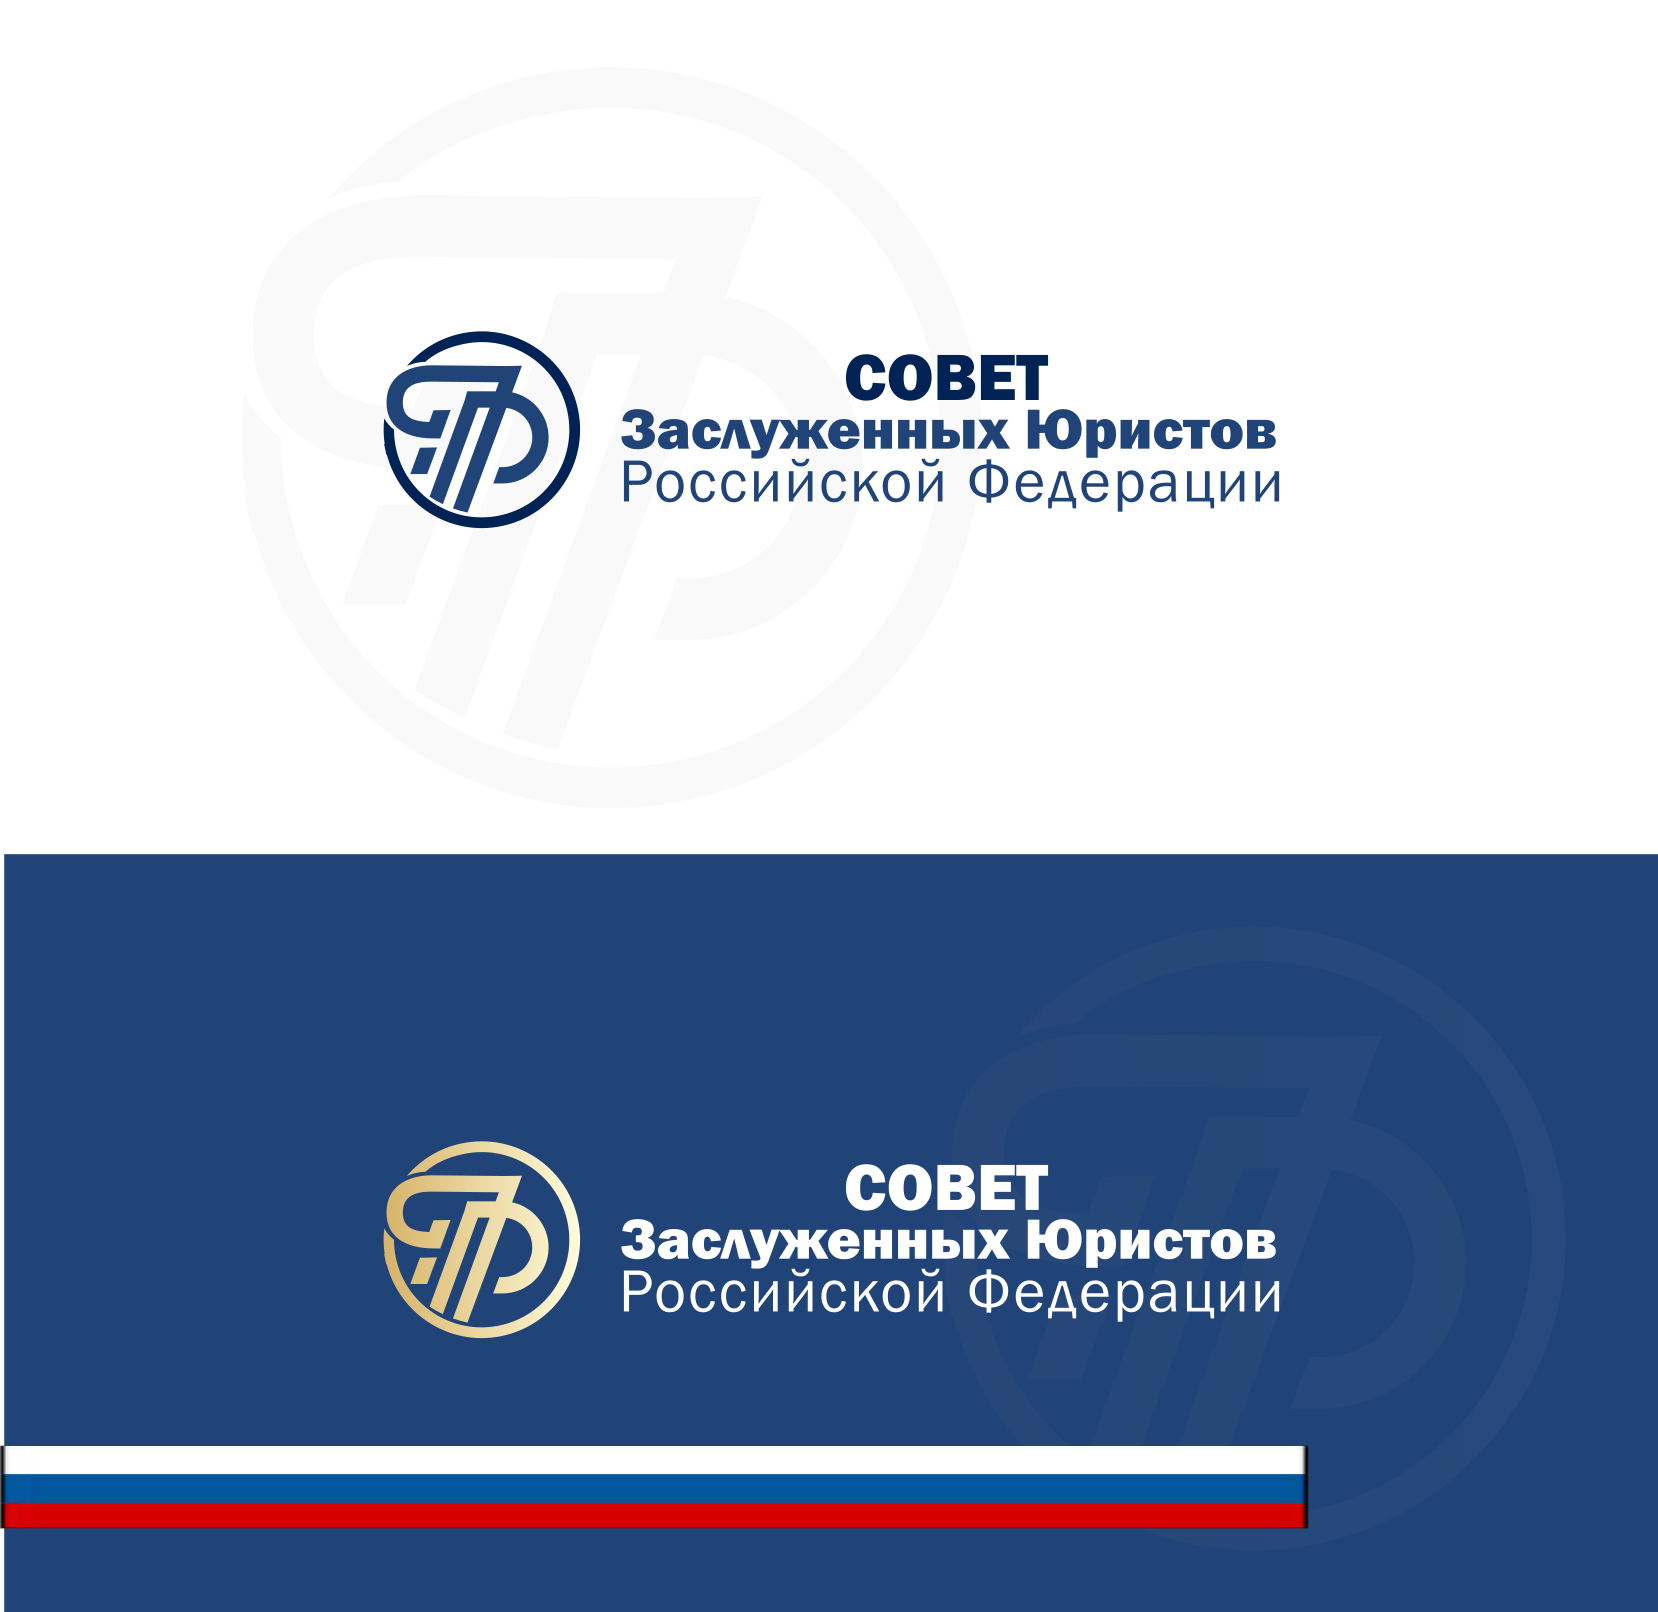 Разработка логотипа Совета (Клуба) заслуженных юристов Российской Федерации фото f_6535e3db02720b68.png